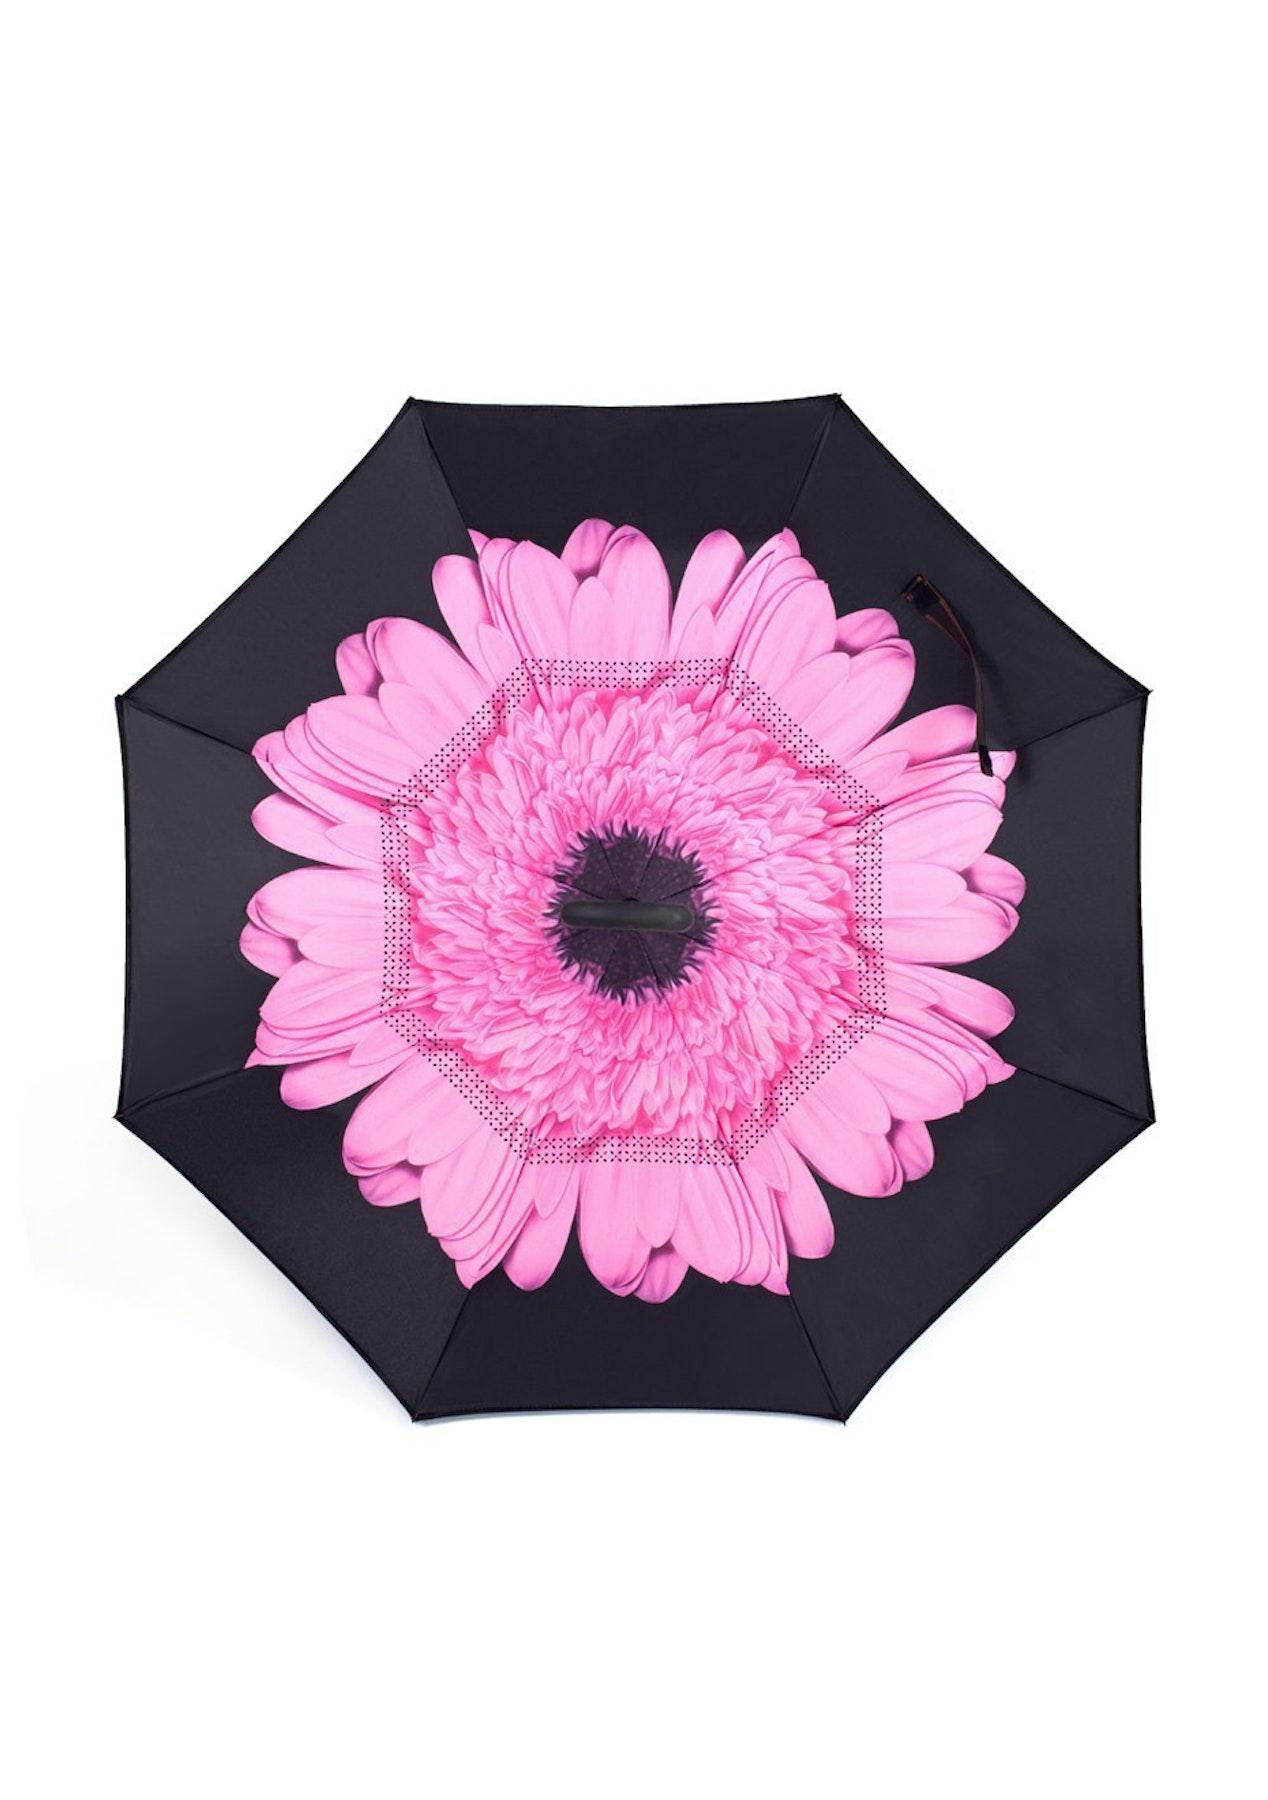 Inverted umbrella pink flower stuff for a rainy day umbrellas inverted umbrella pink flower mightylinksfo Images